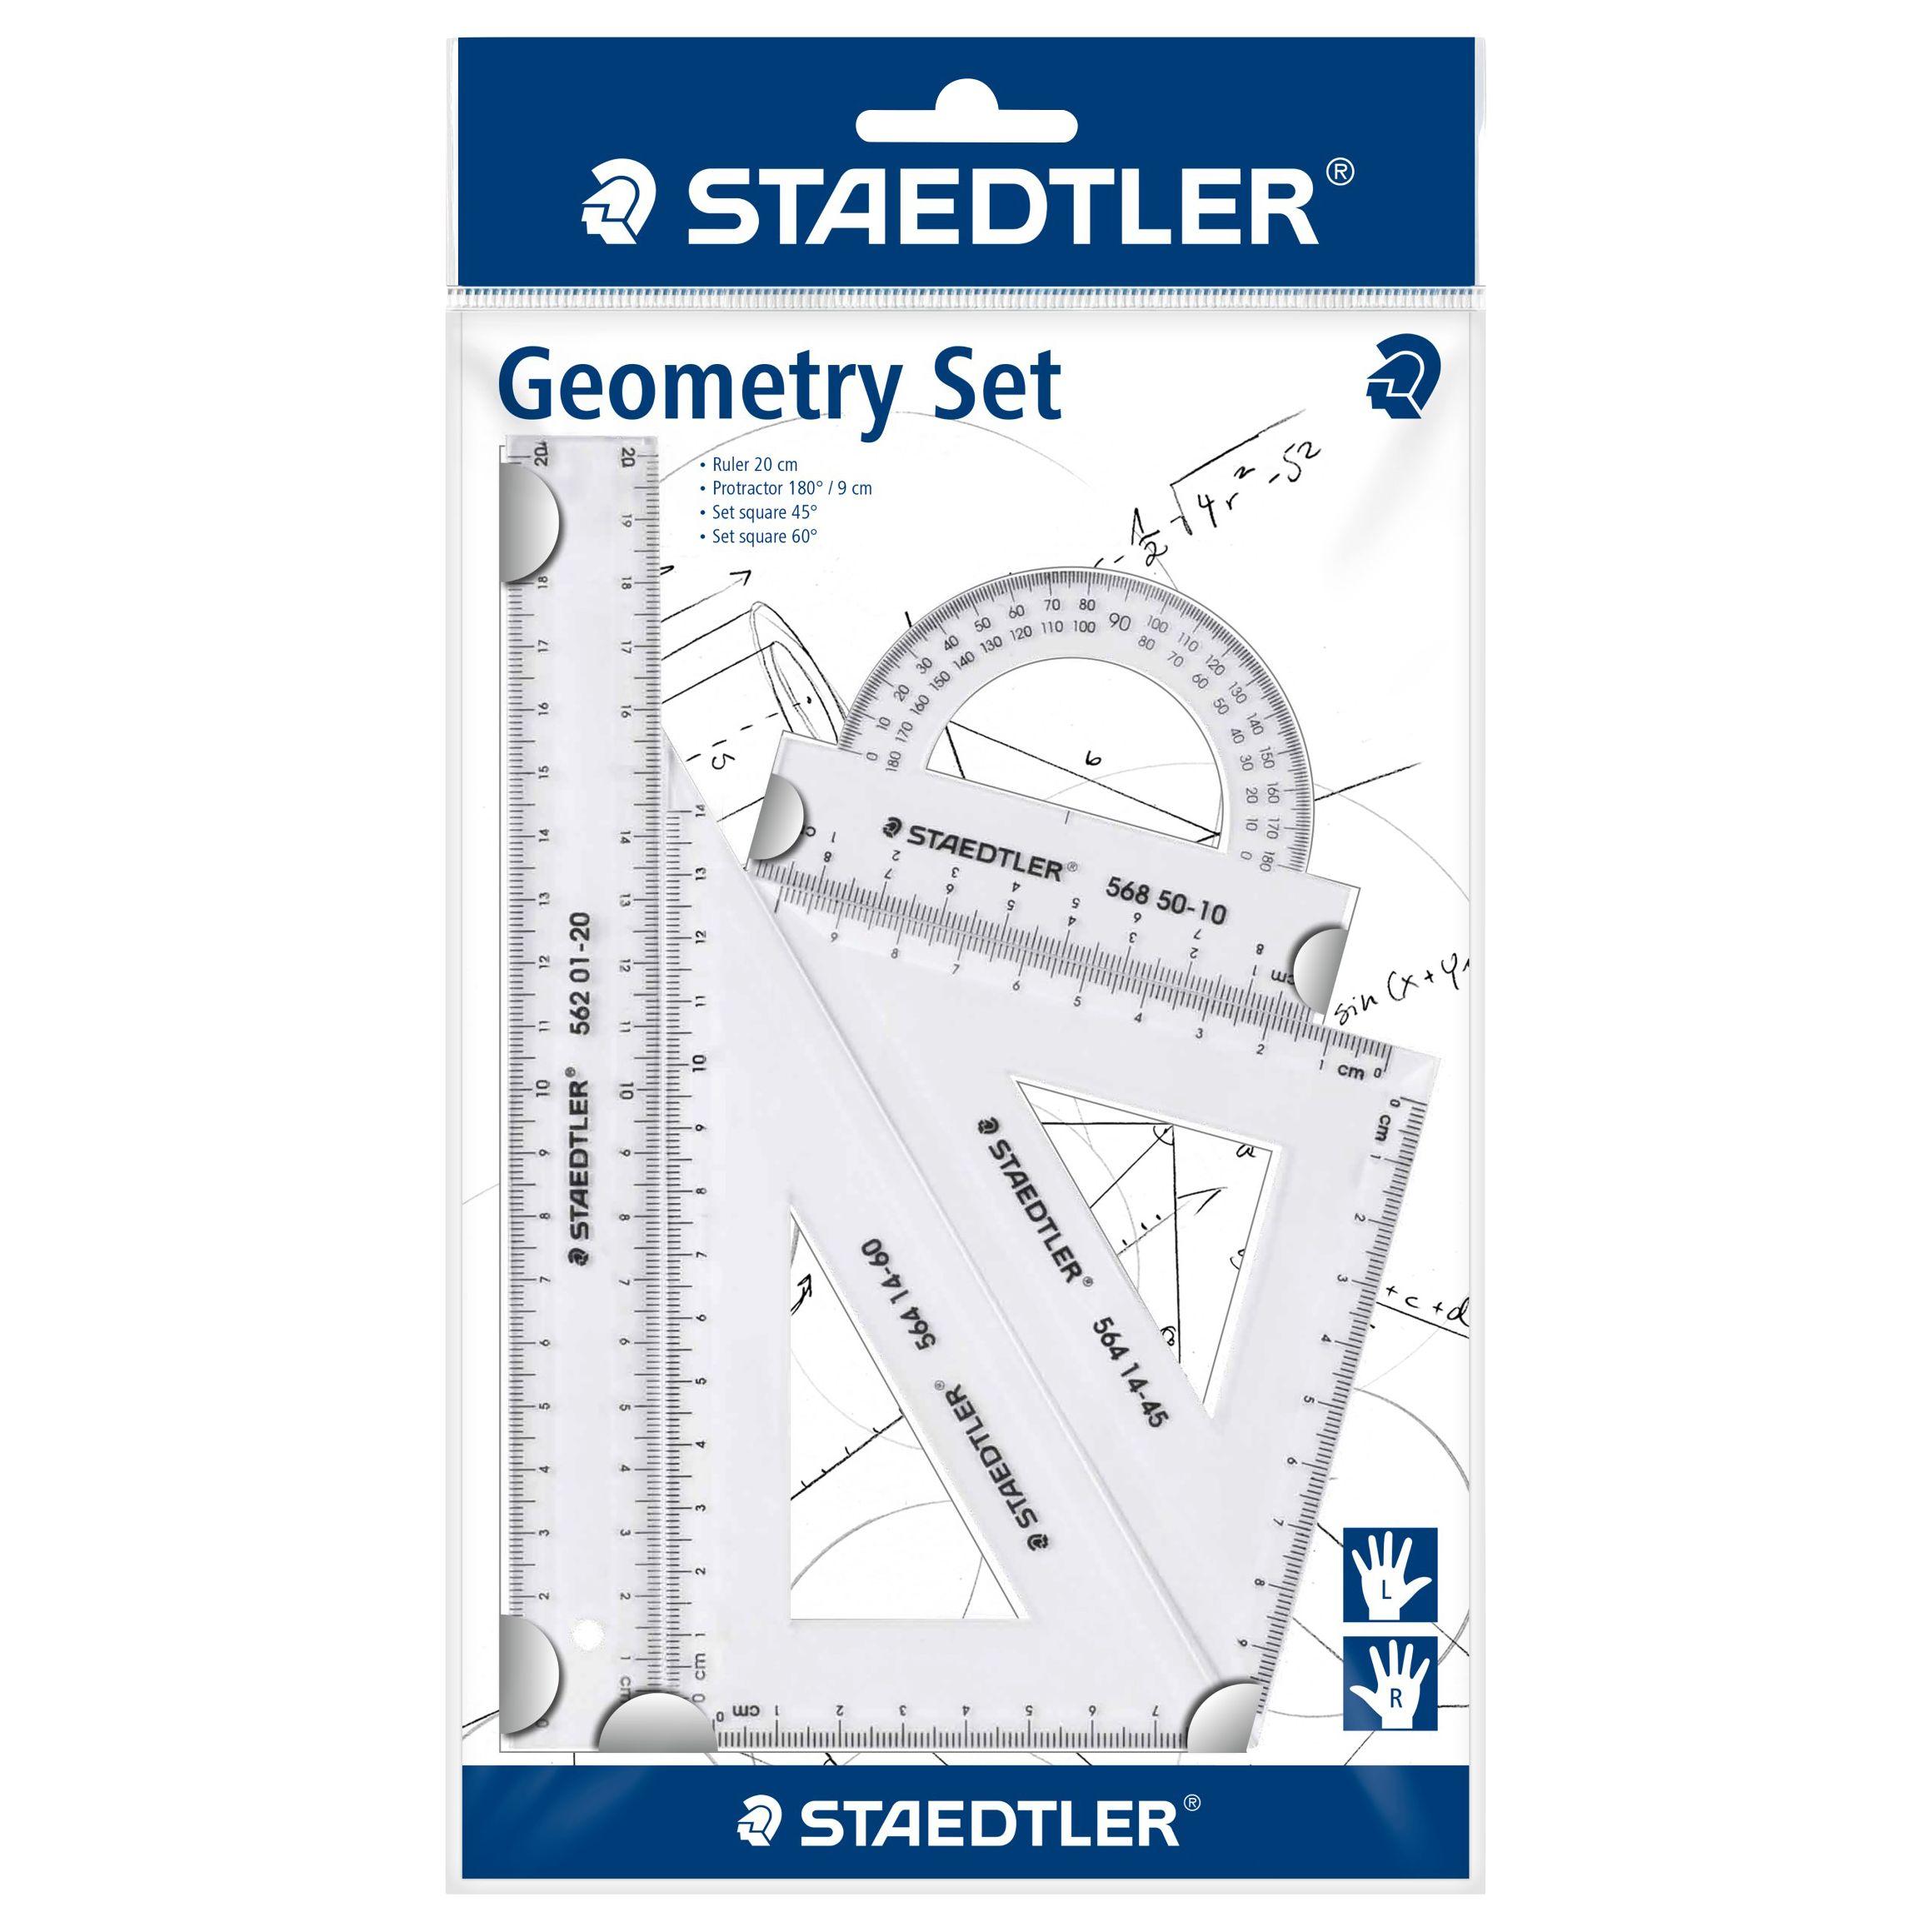 Staedtler STAEDTLER Geometry Set